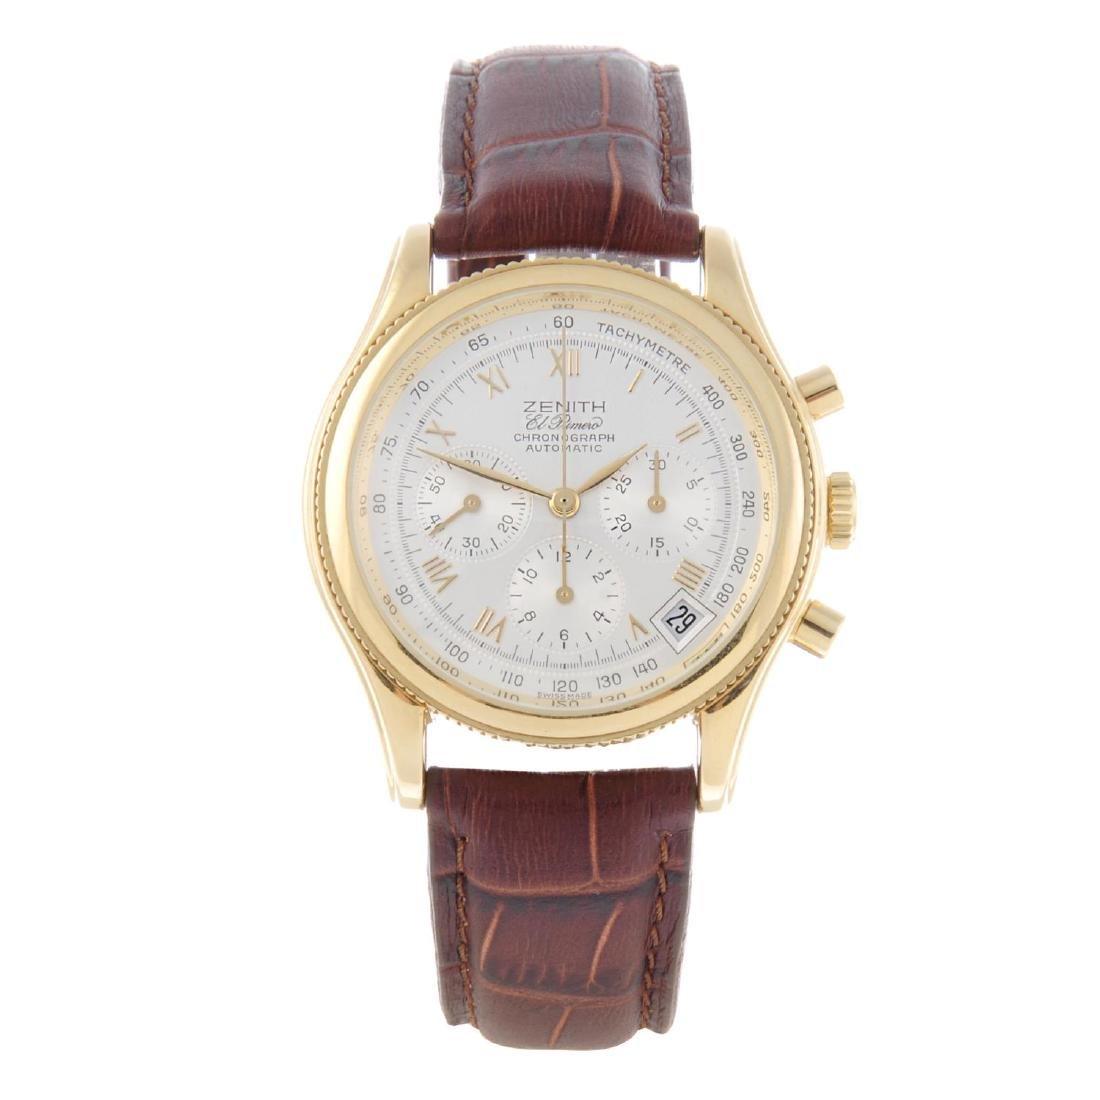 ZENITH - a gentleman's El Primero chronograph wrist